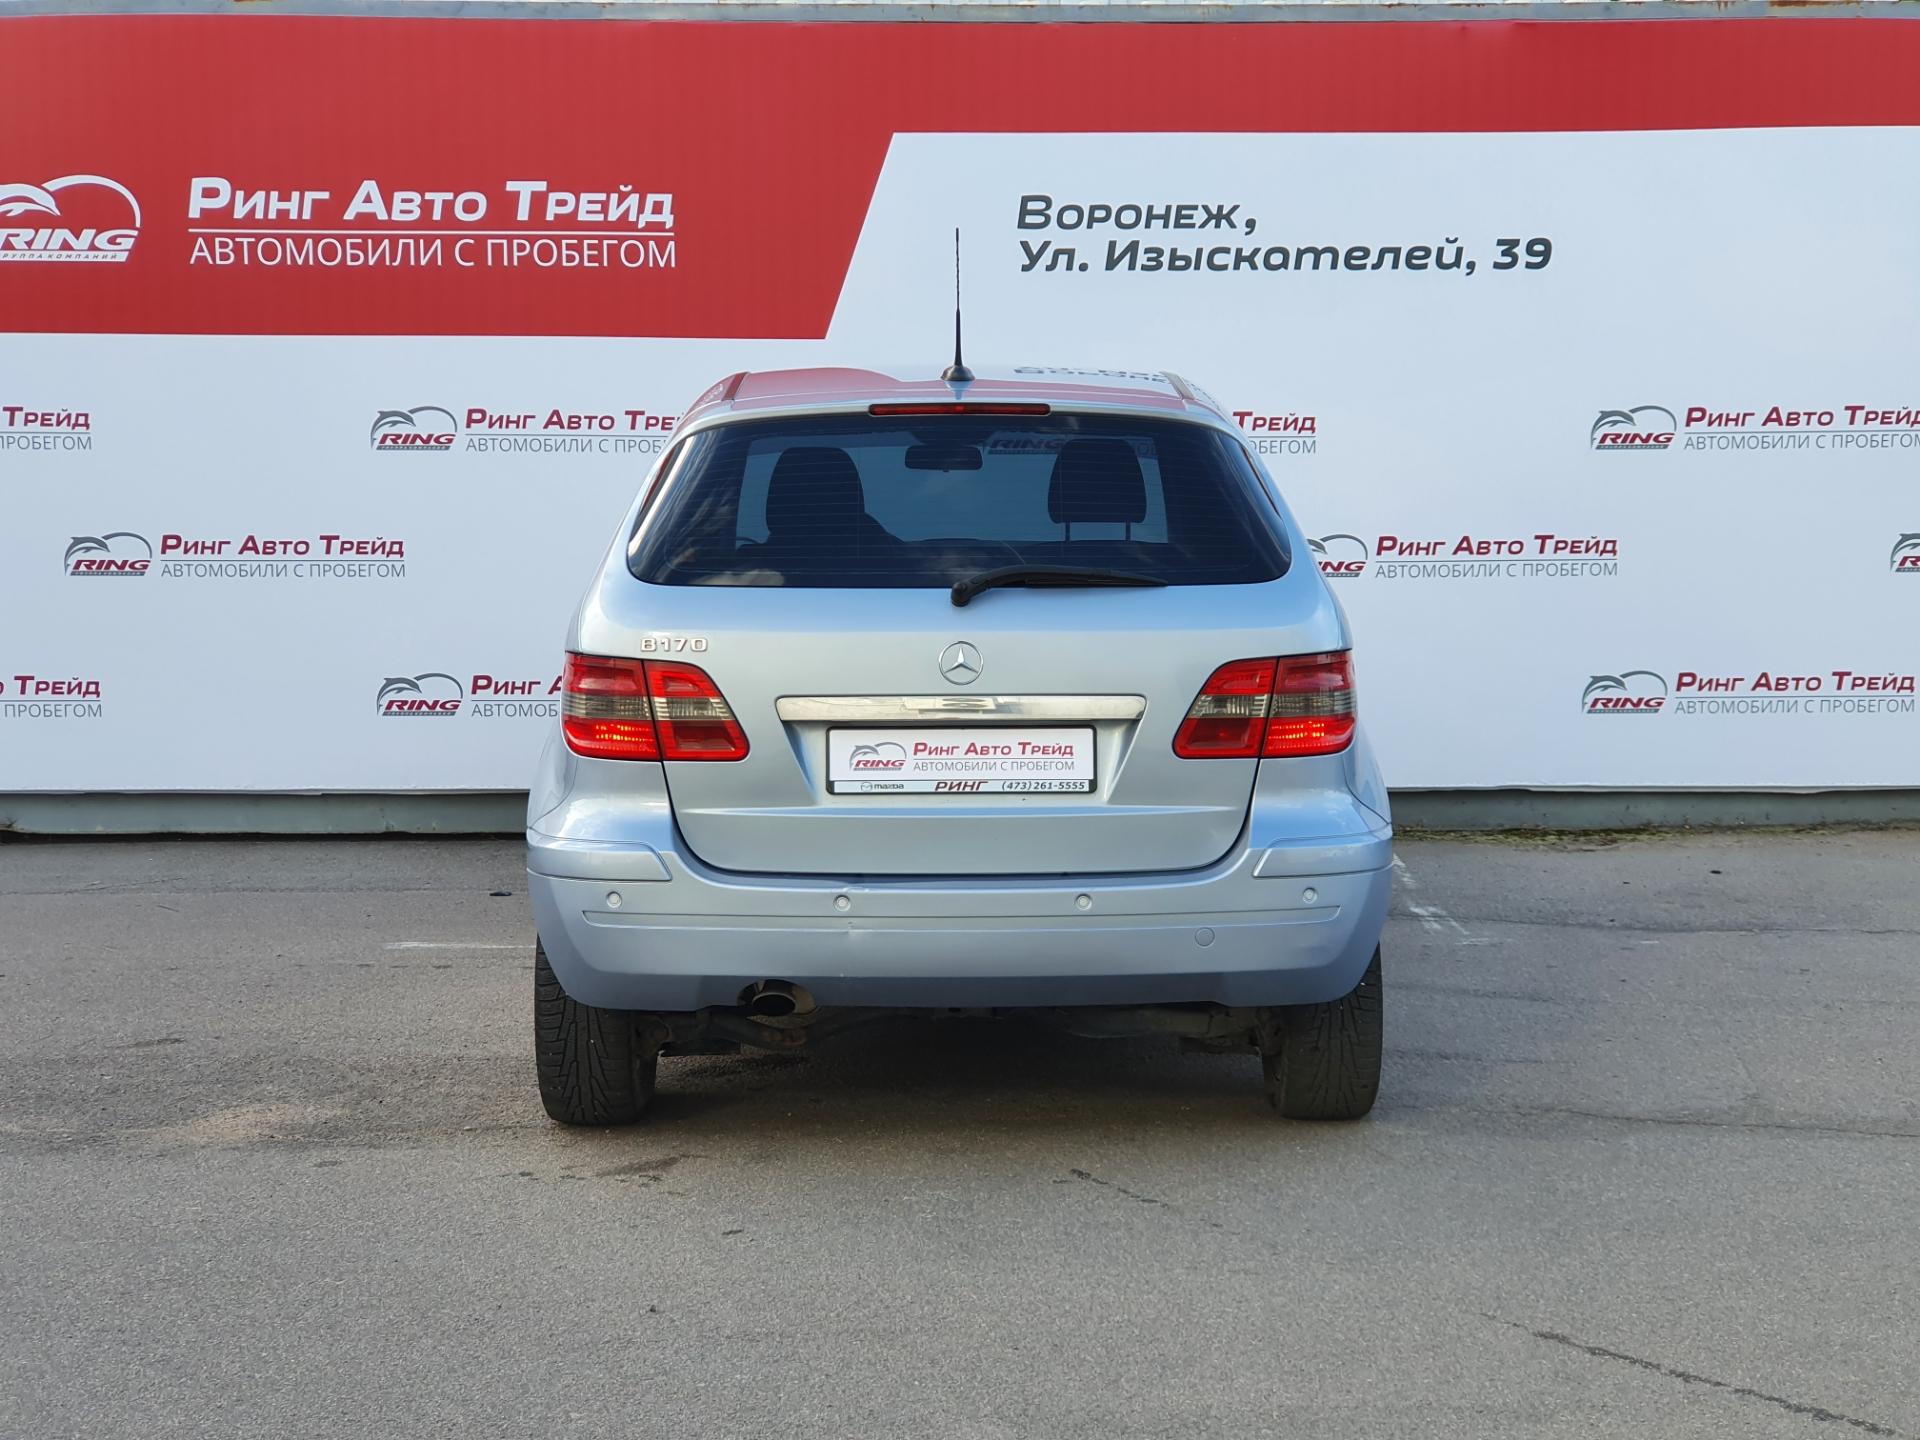 Mercedes-Benz B-Класс Хэтчбек (2007г.)